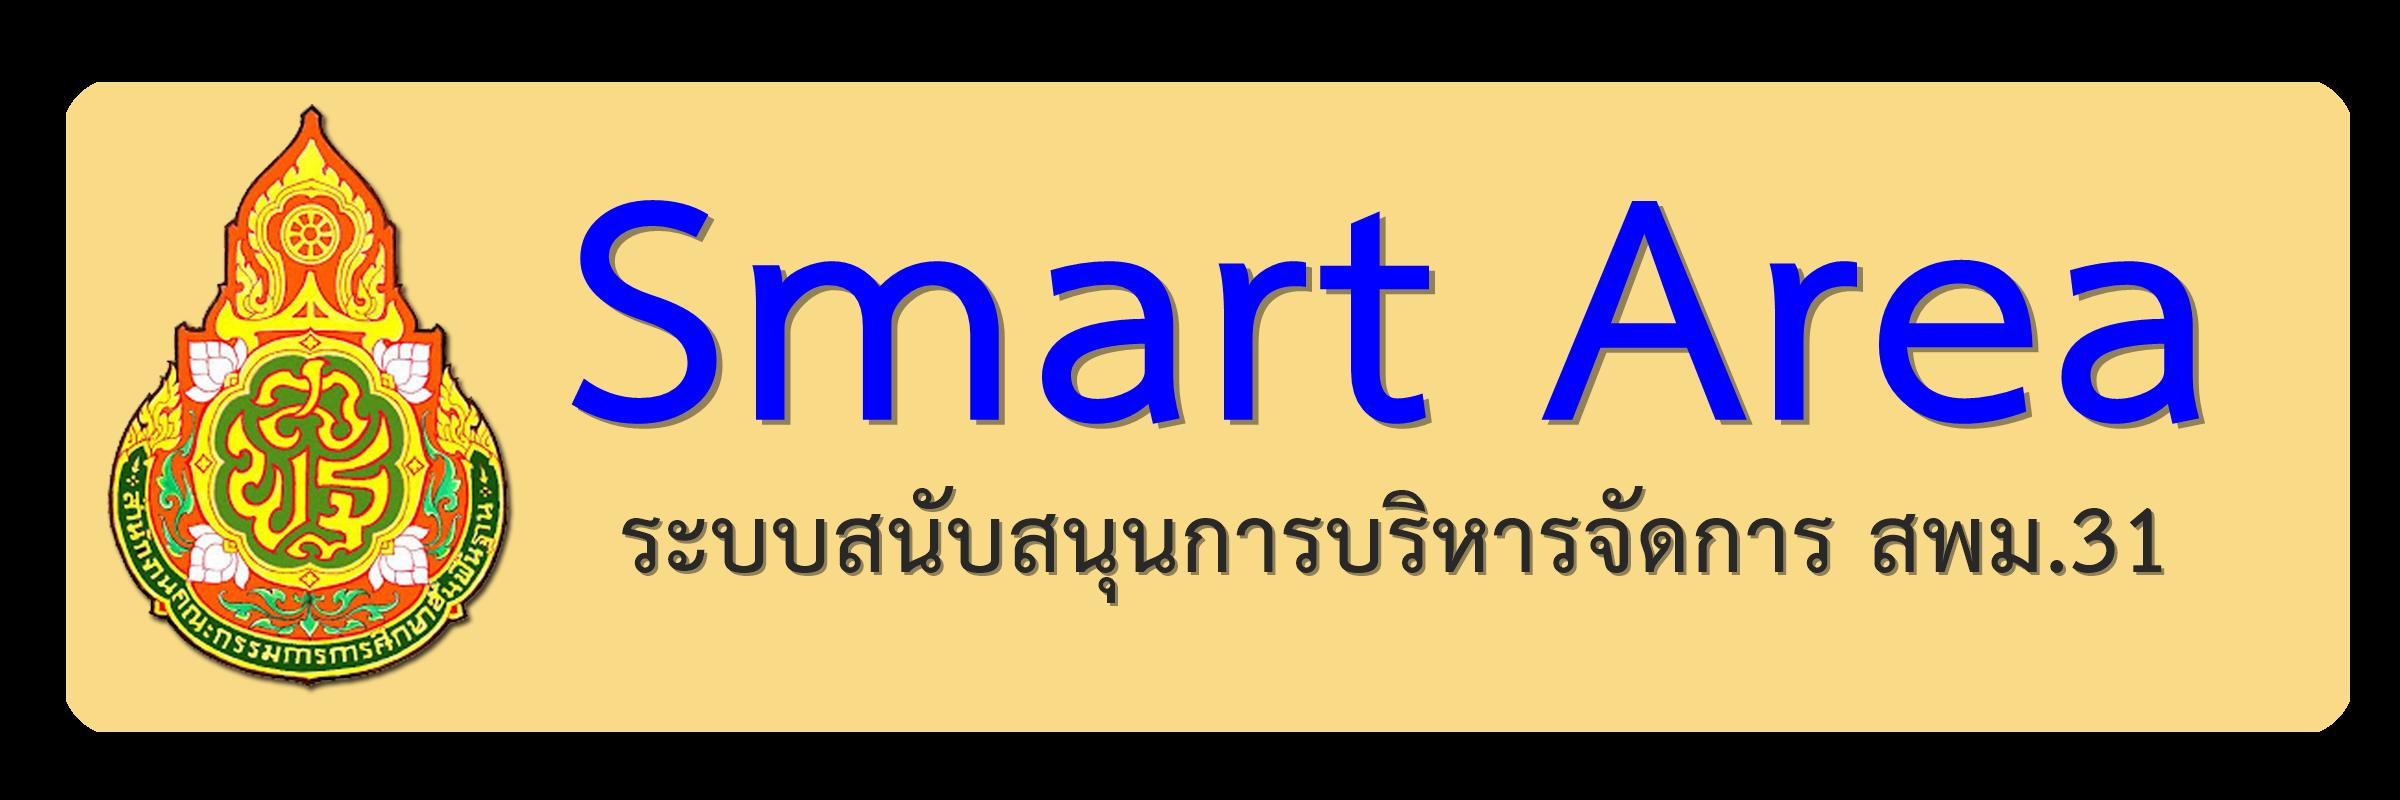 http://amss.mattayom31.go.th/